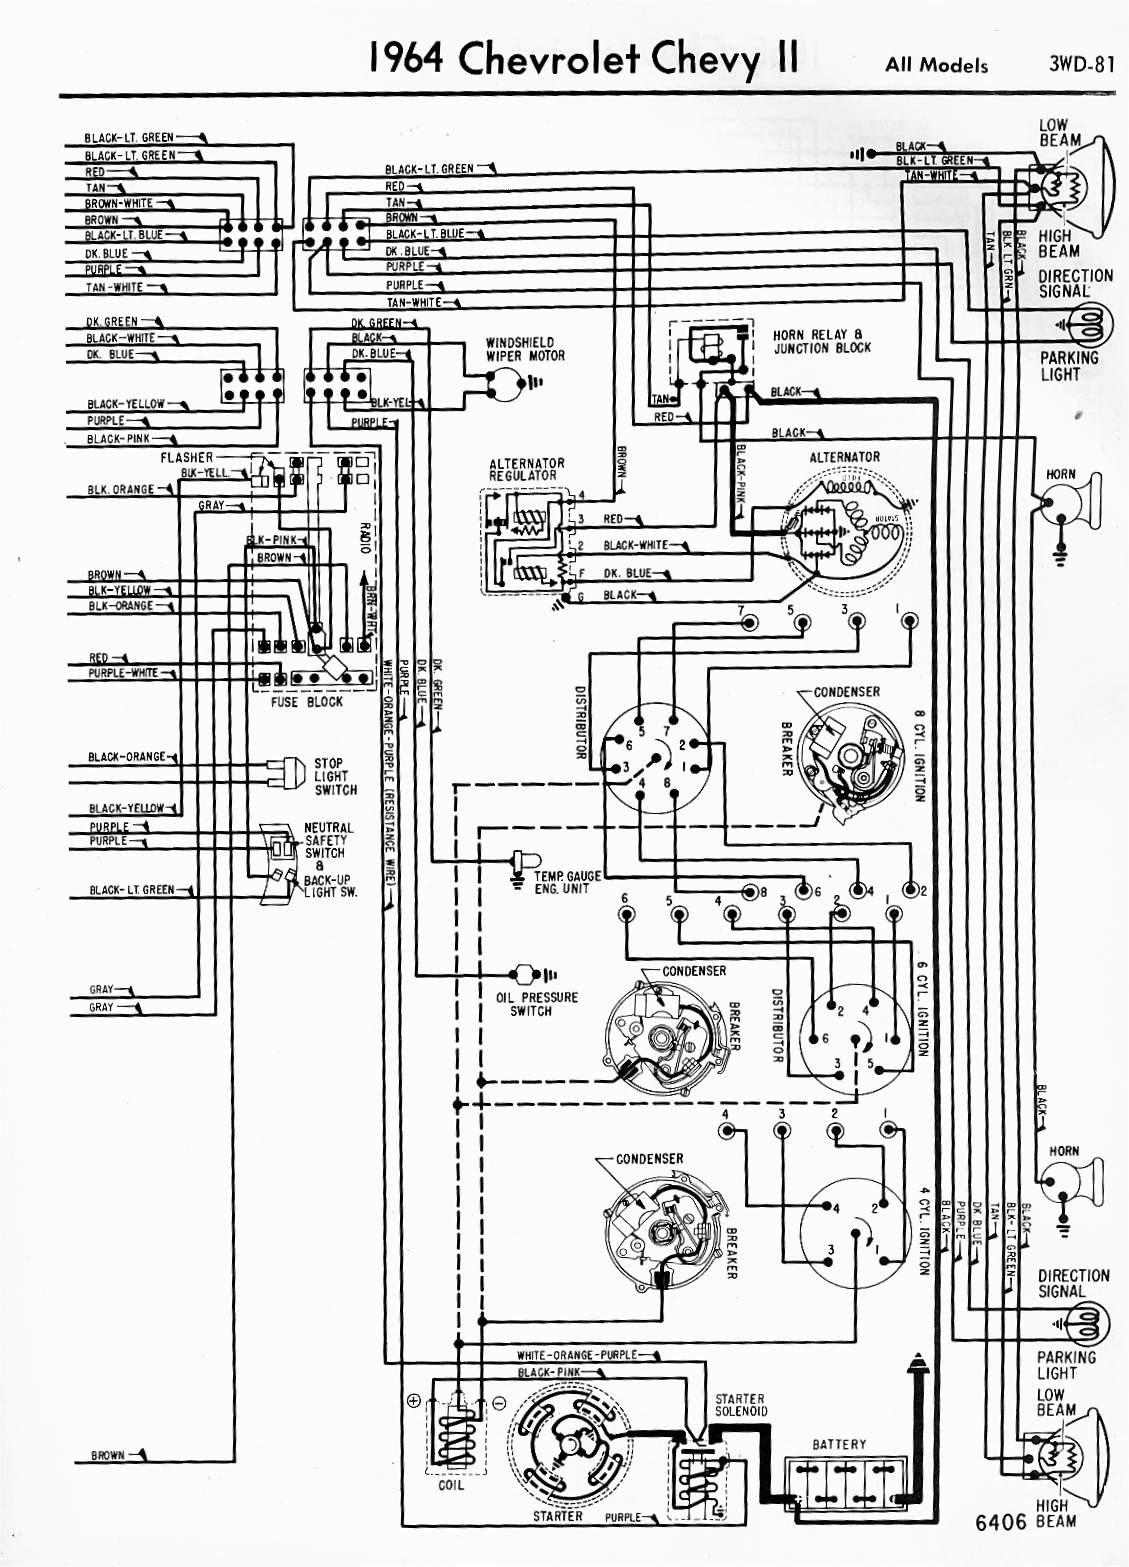 1977 Mack Wiring Diagram Trusted Dm